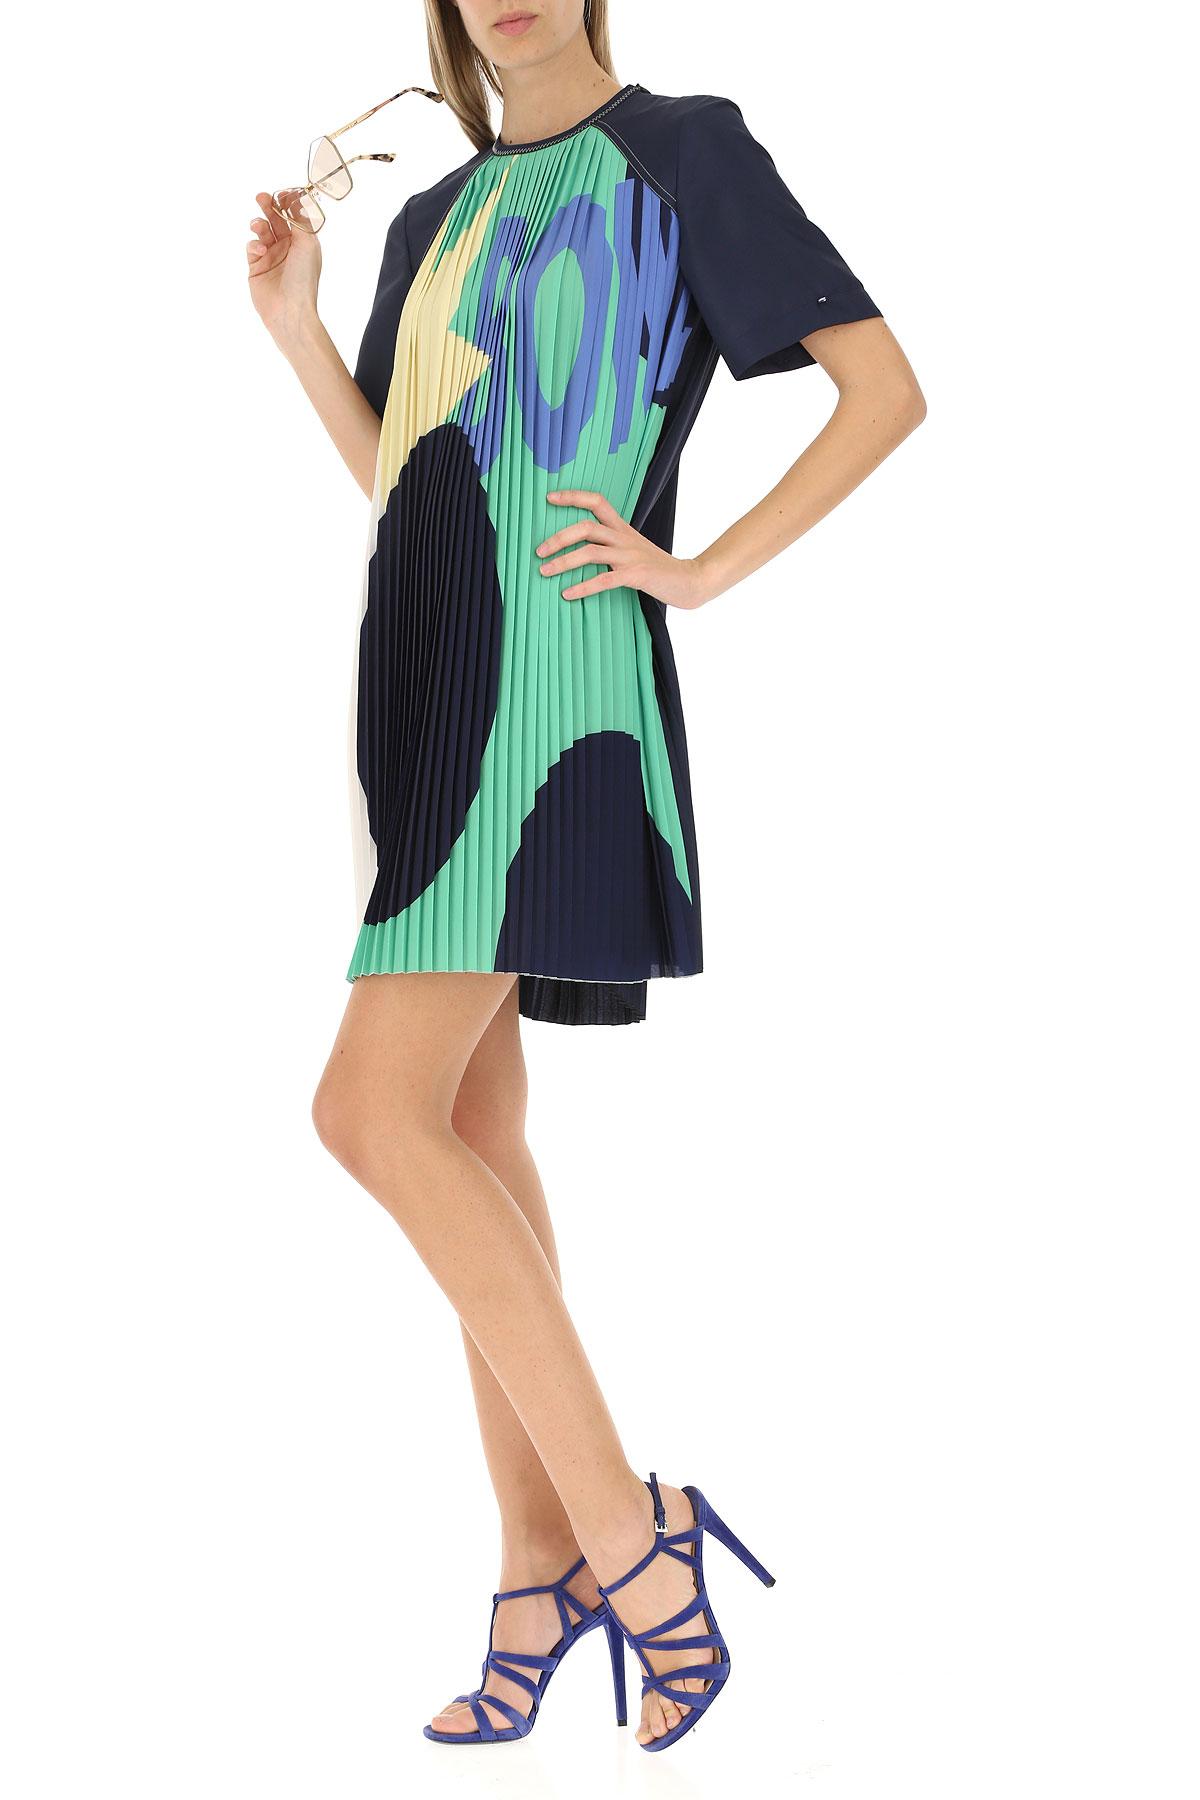 Menta Primavera Mujer verano 2019 Ropa nbsp;amarillo Azul Claro Verde Oscuro Para Sportmax Fwq60tx